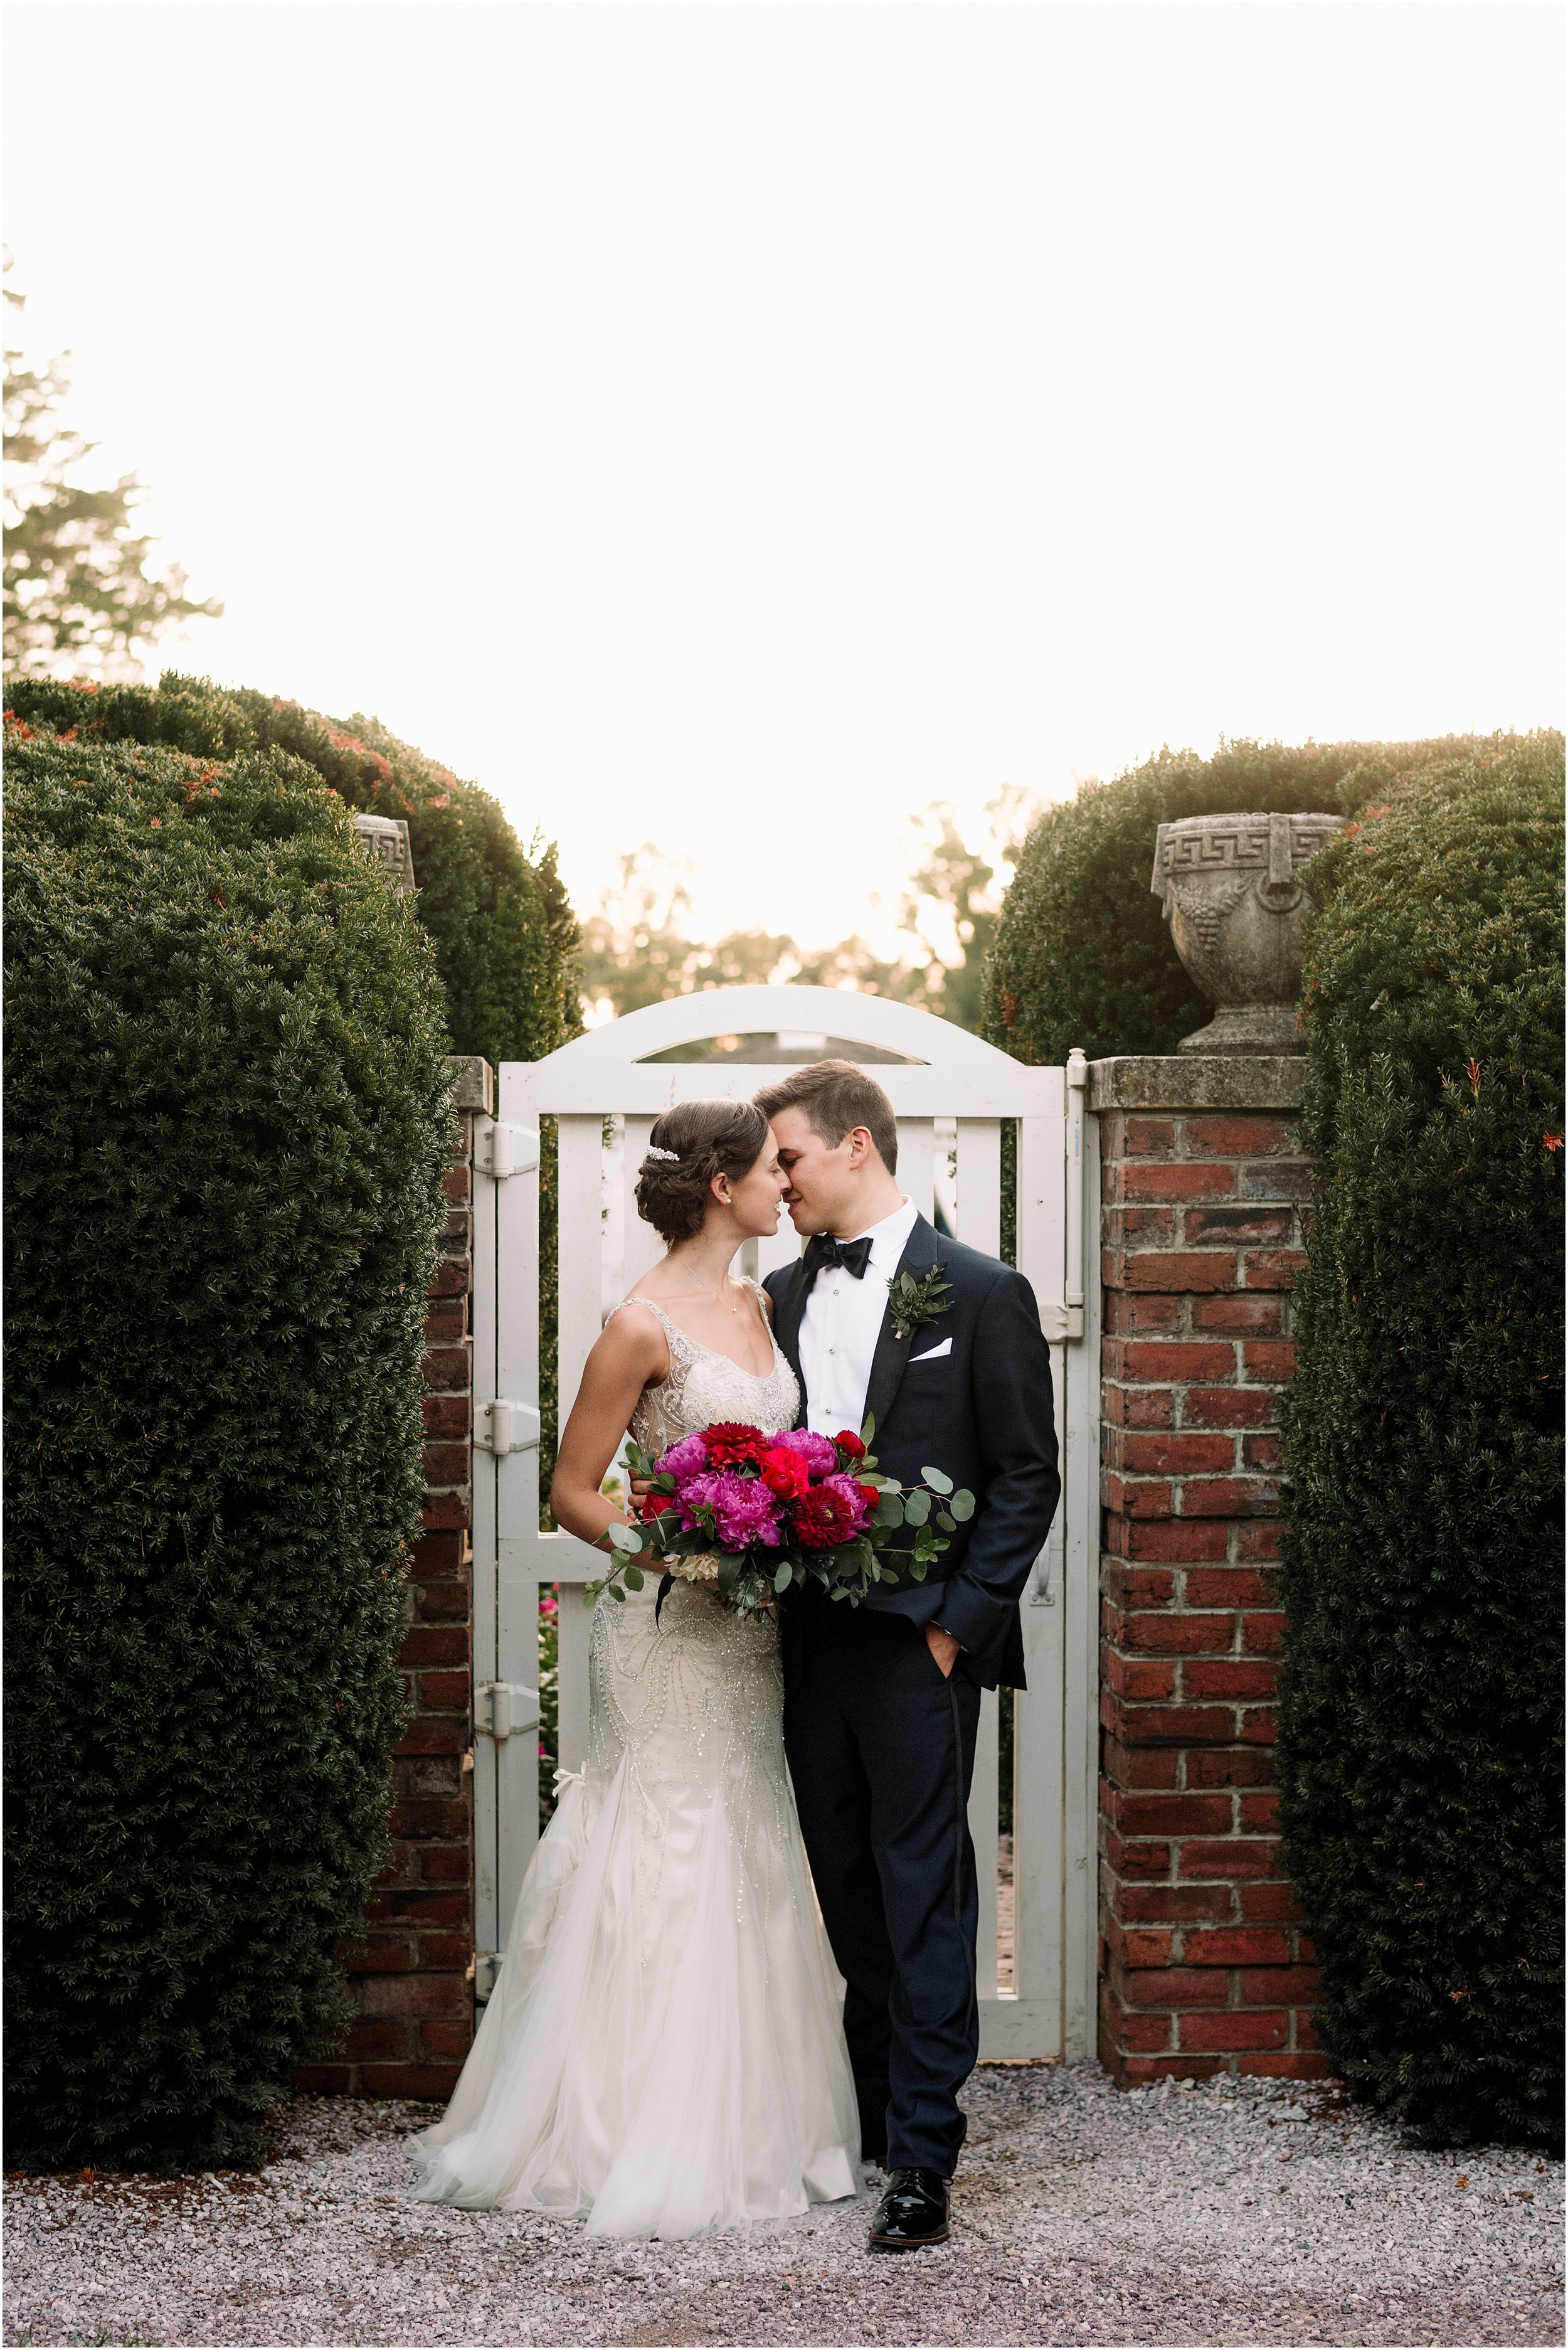 hannah leigh photography Antrim 1844 Wedding_1304.jpg